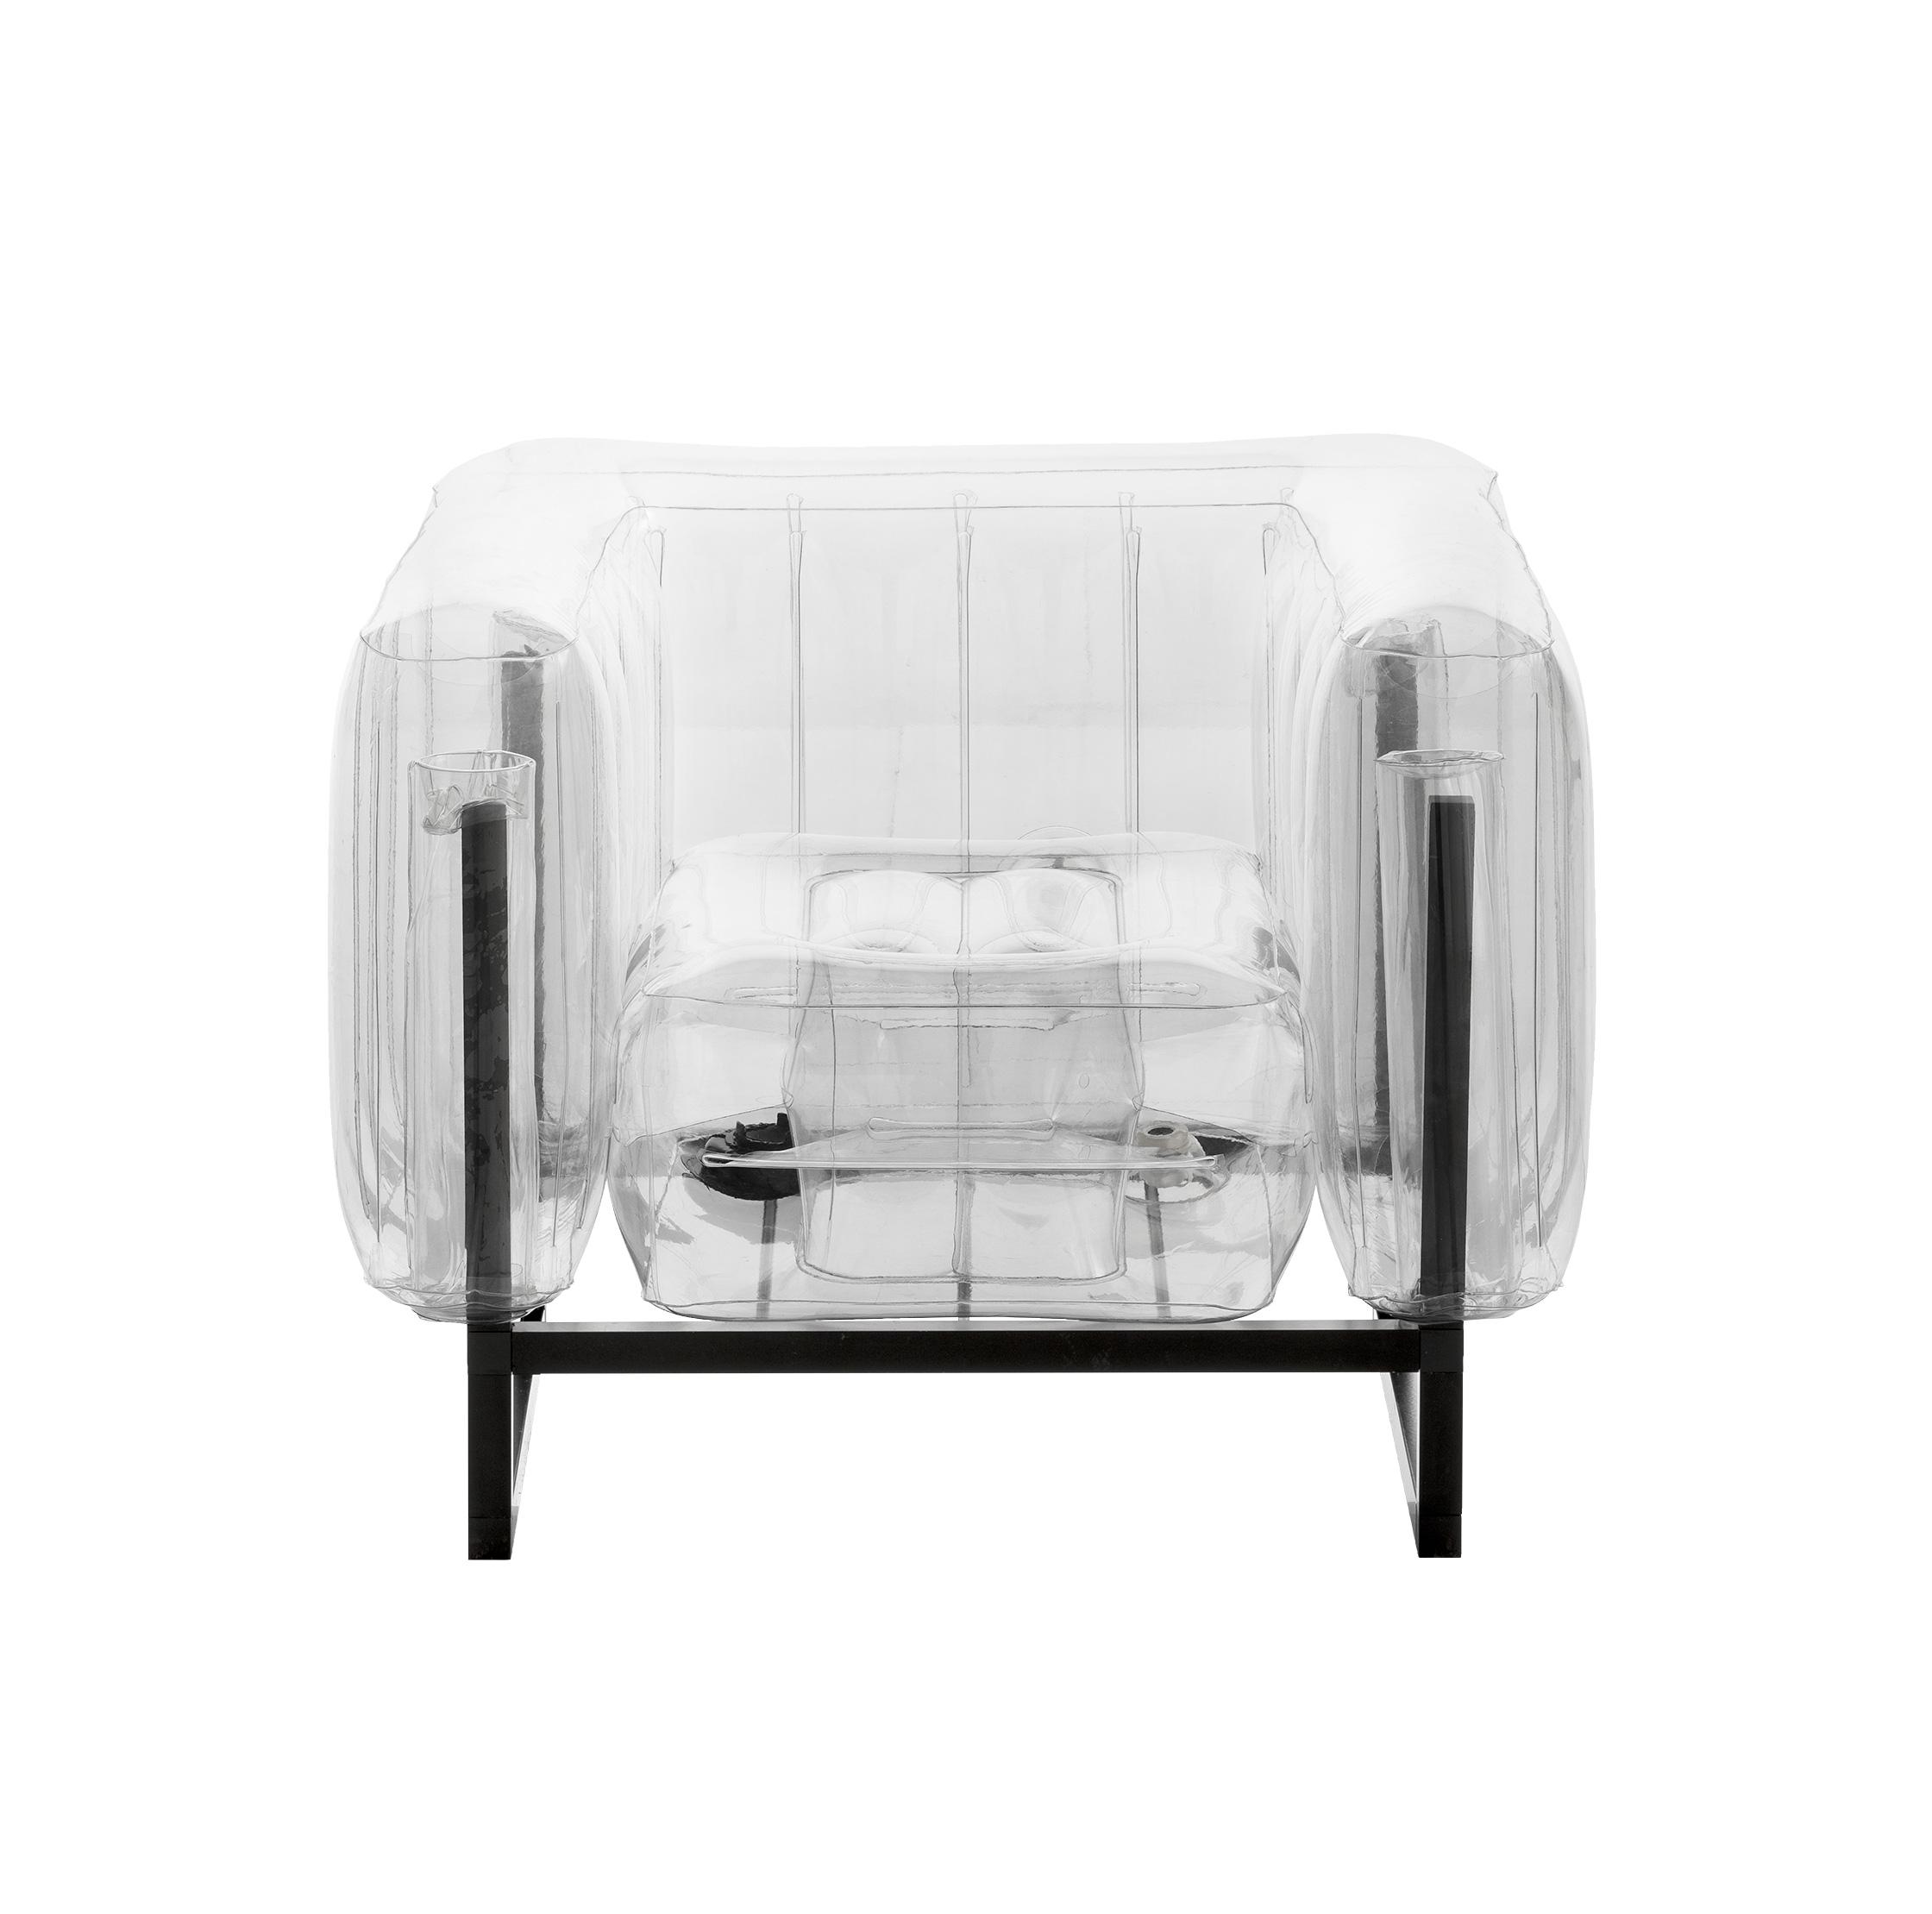 Fauteuil pvc transparent cadre en aluminium